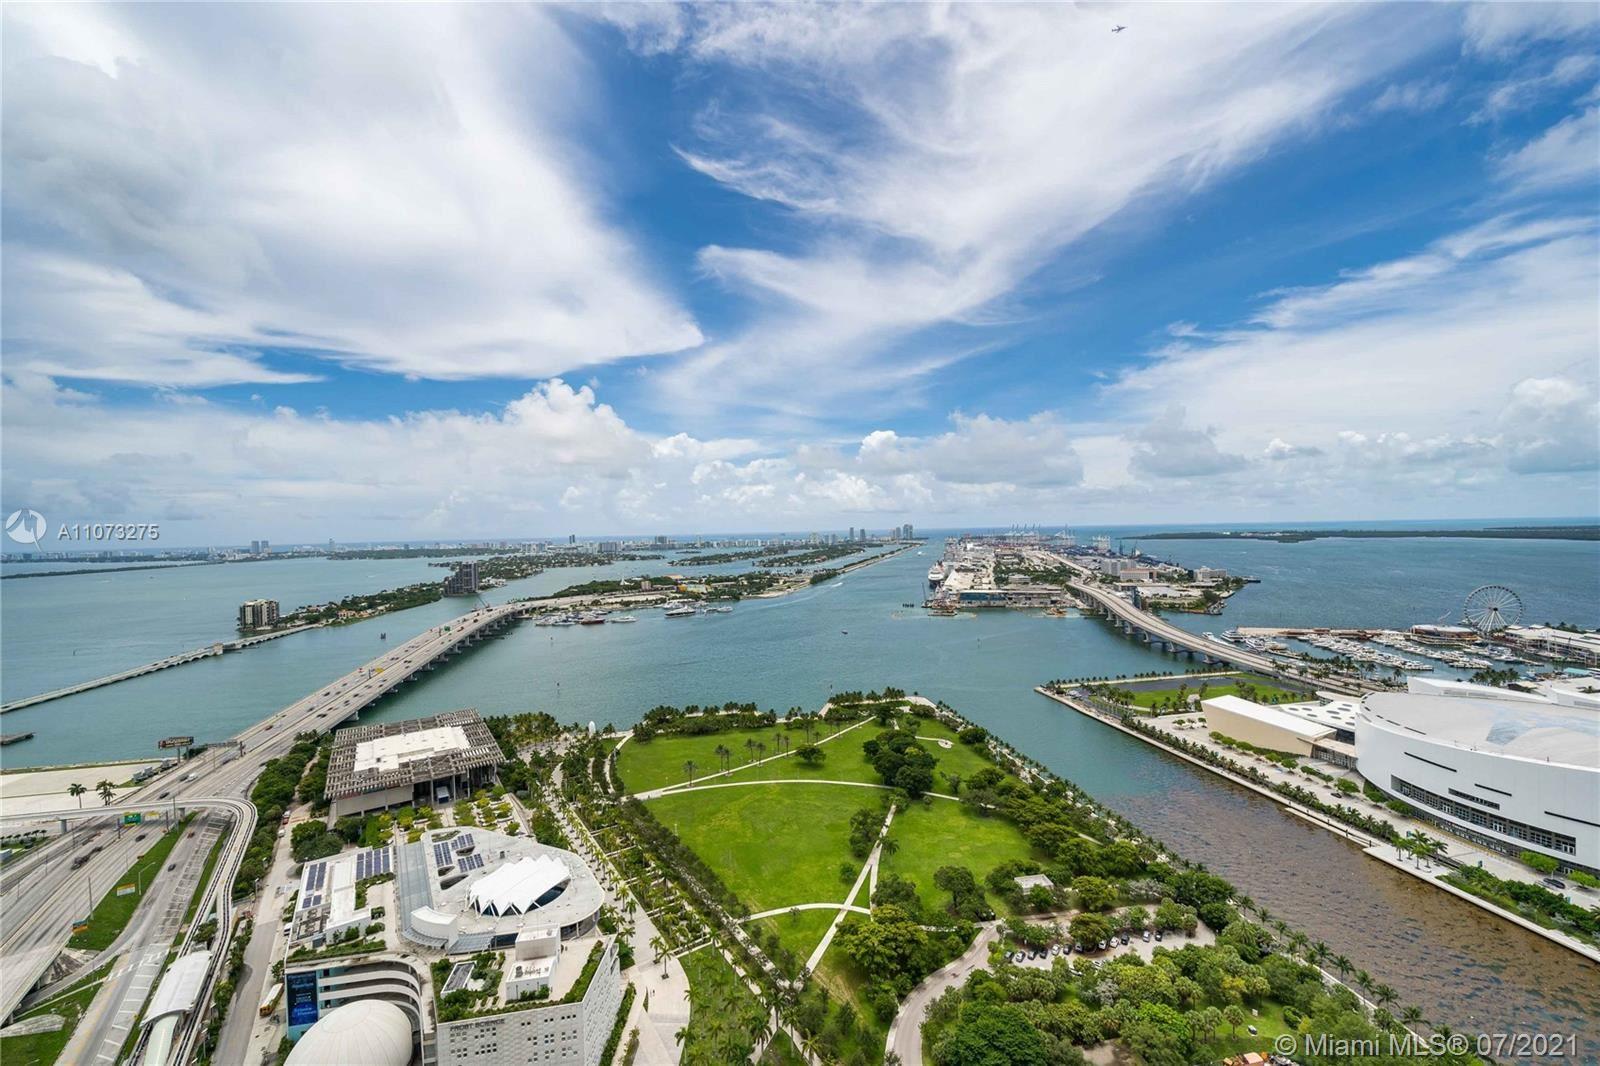 1040 Biscayne Blvd #PH4202, Miami, FL 33132 - #: A11073275